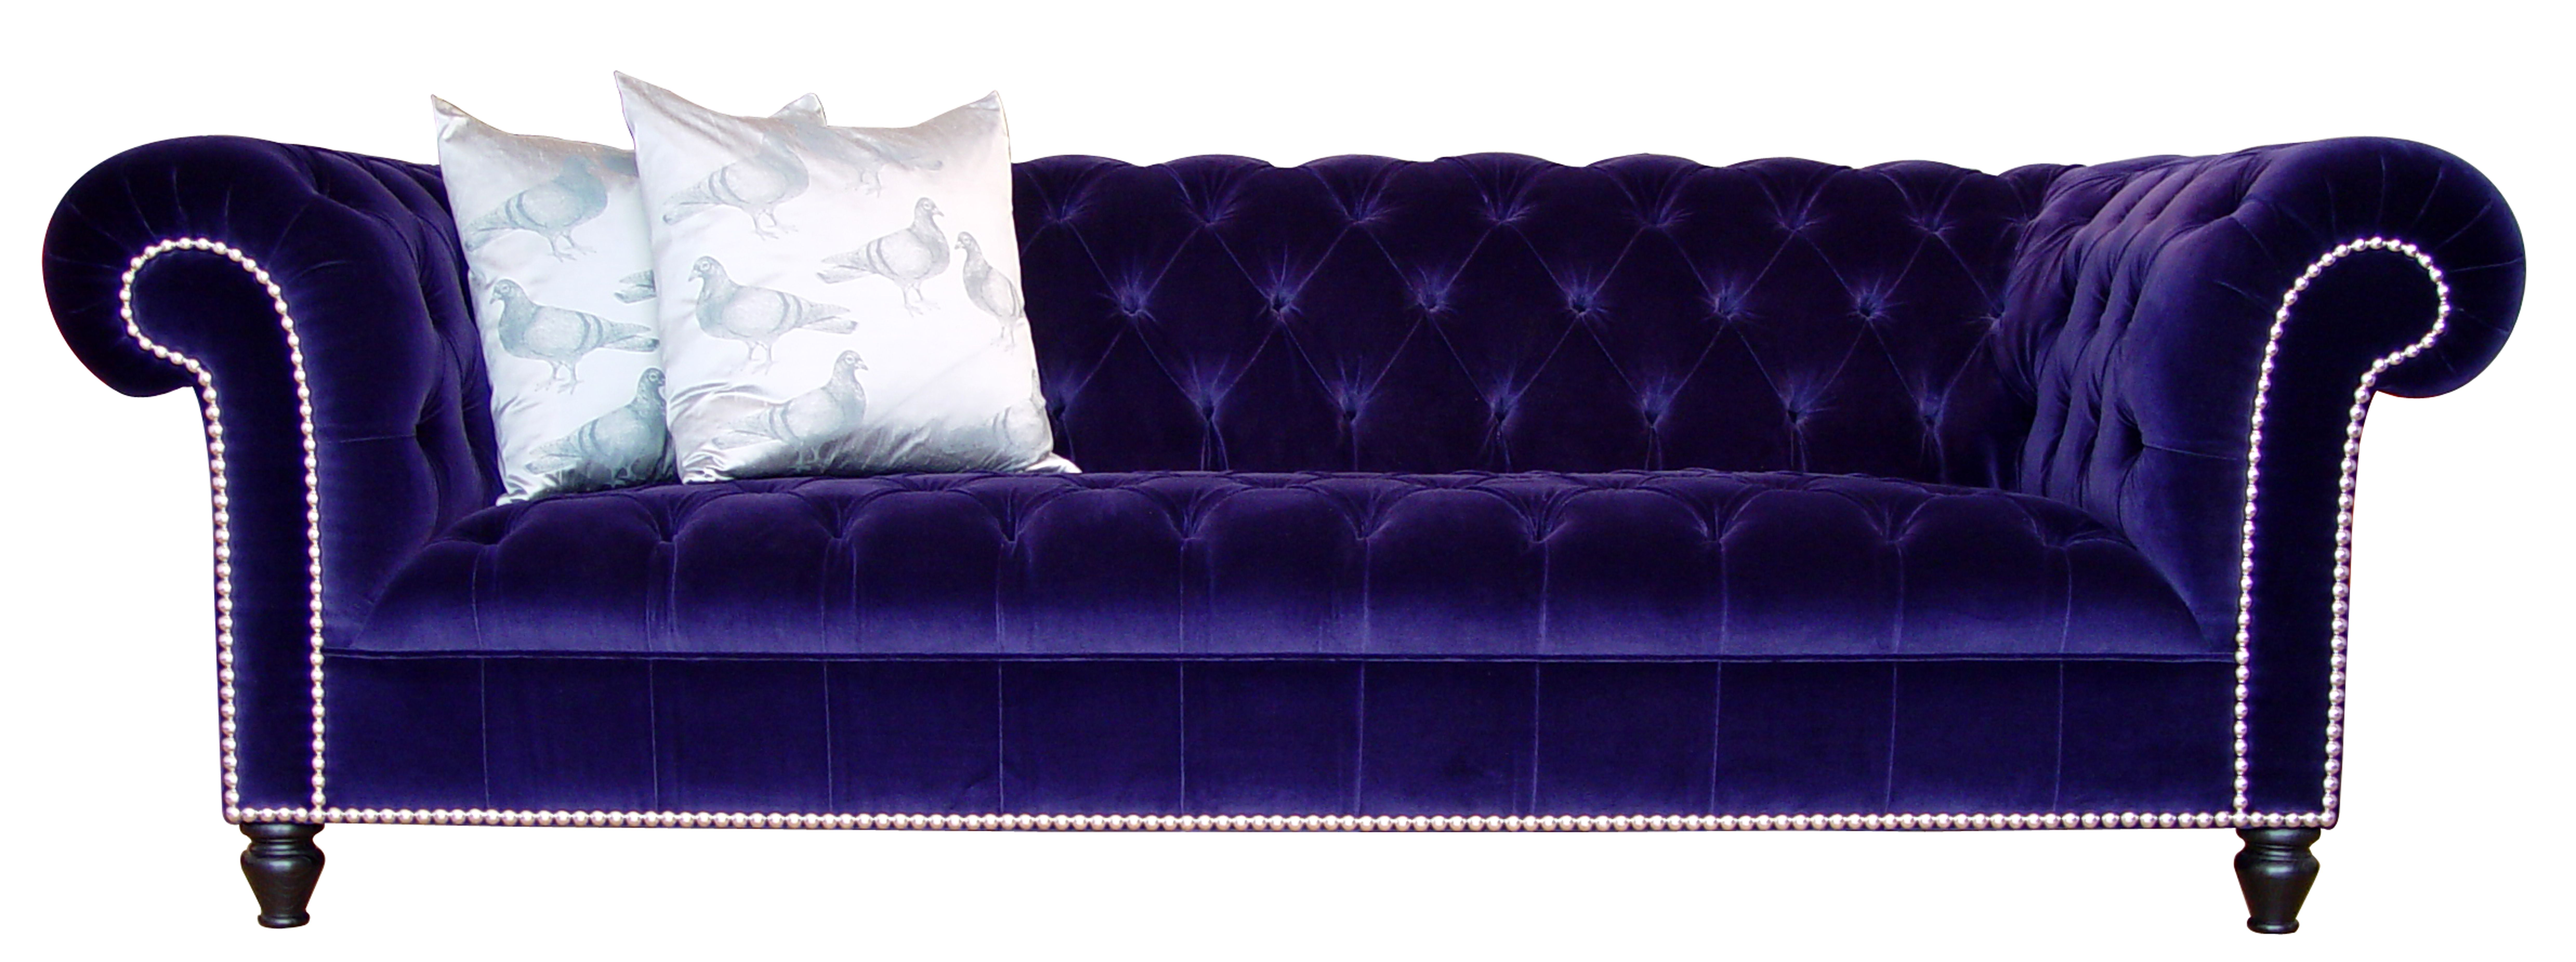 Chesterfield Sofa   Google Search